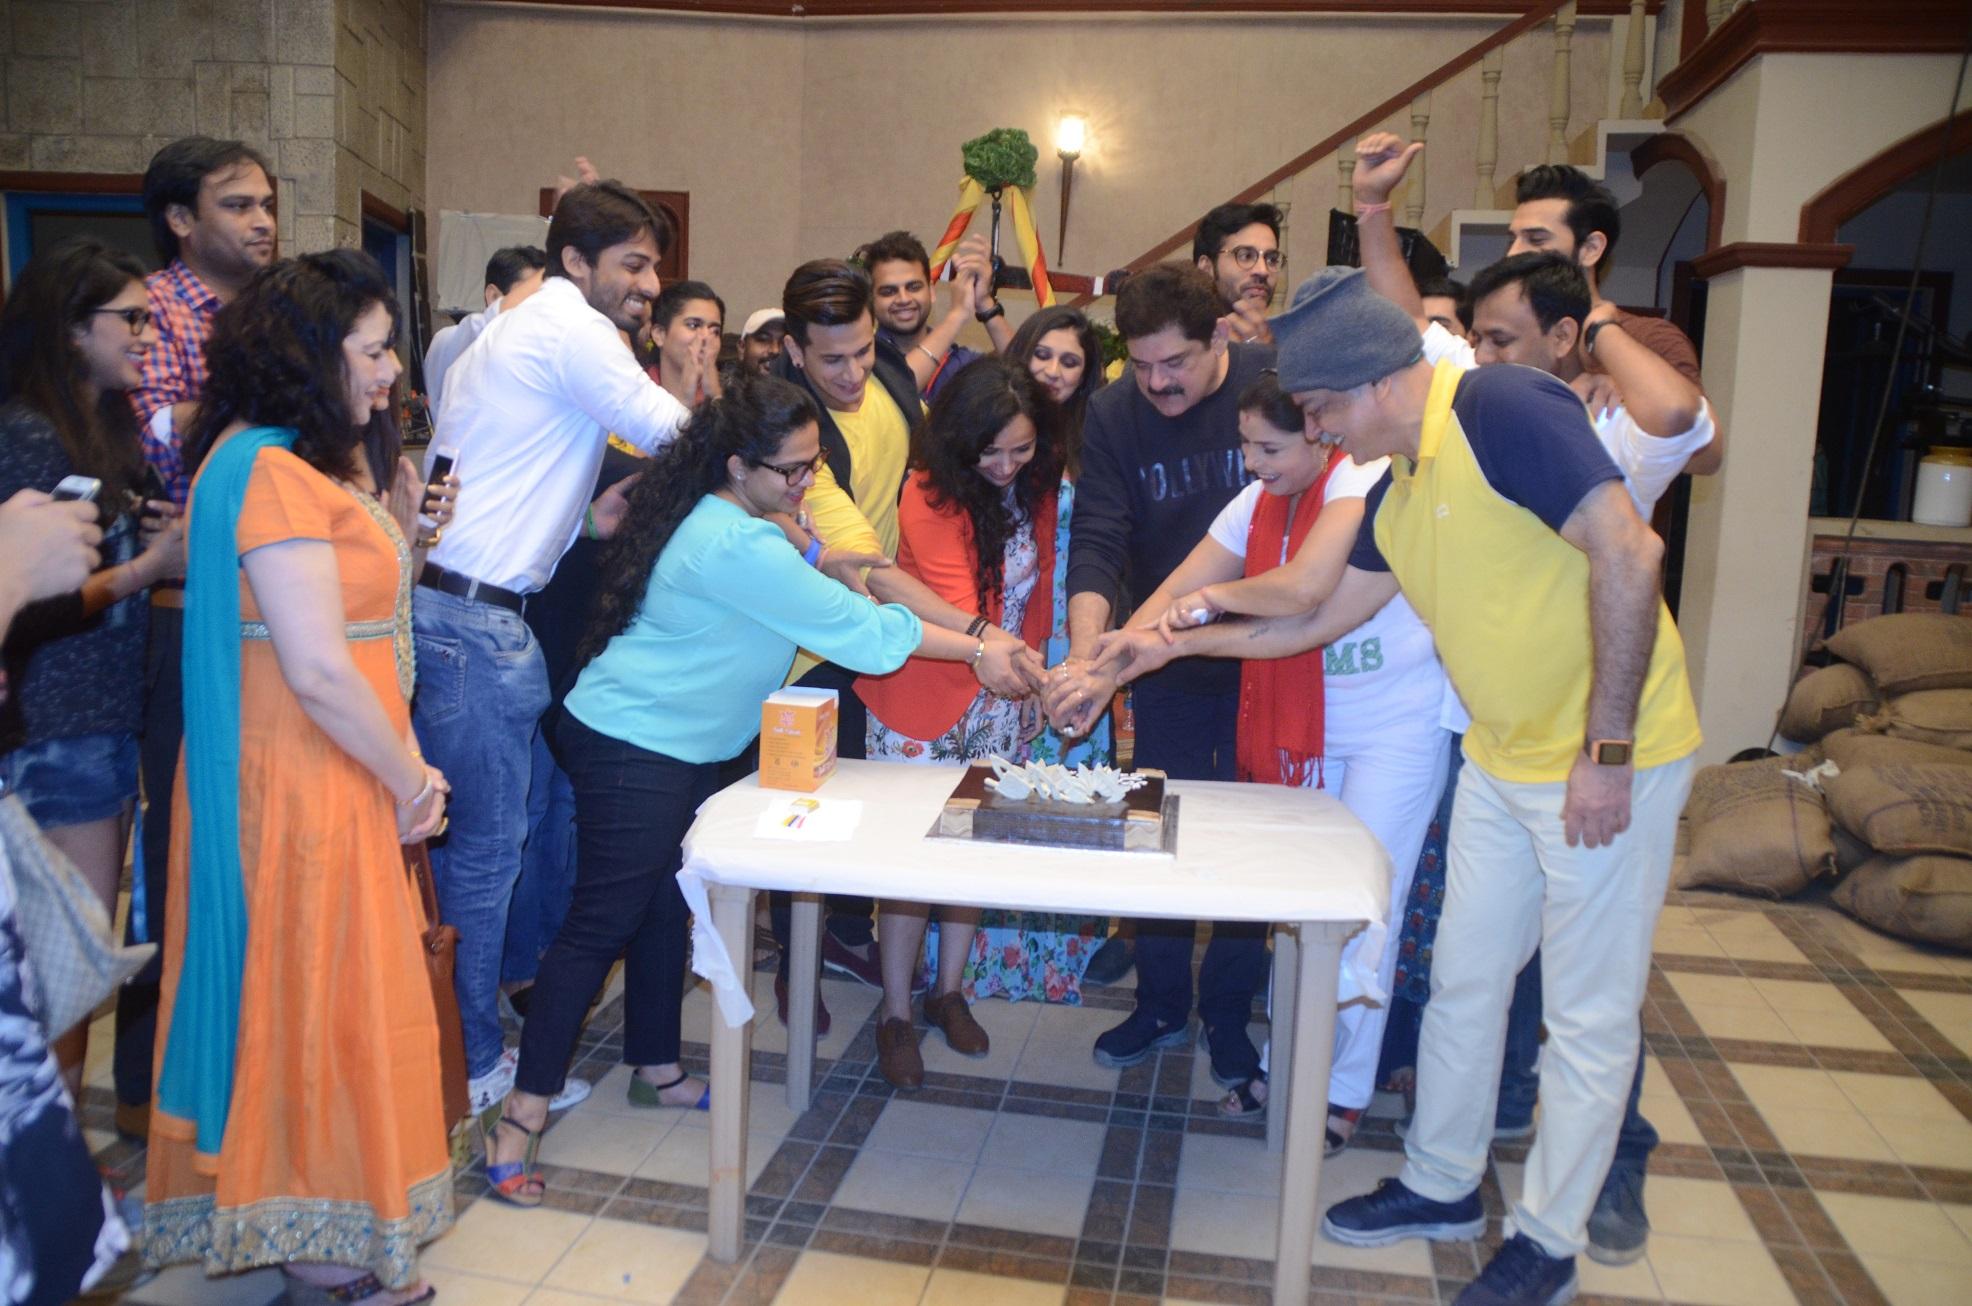 group-cutting-cake